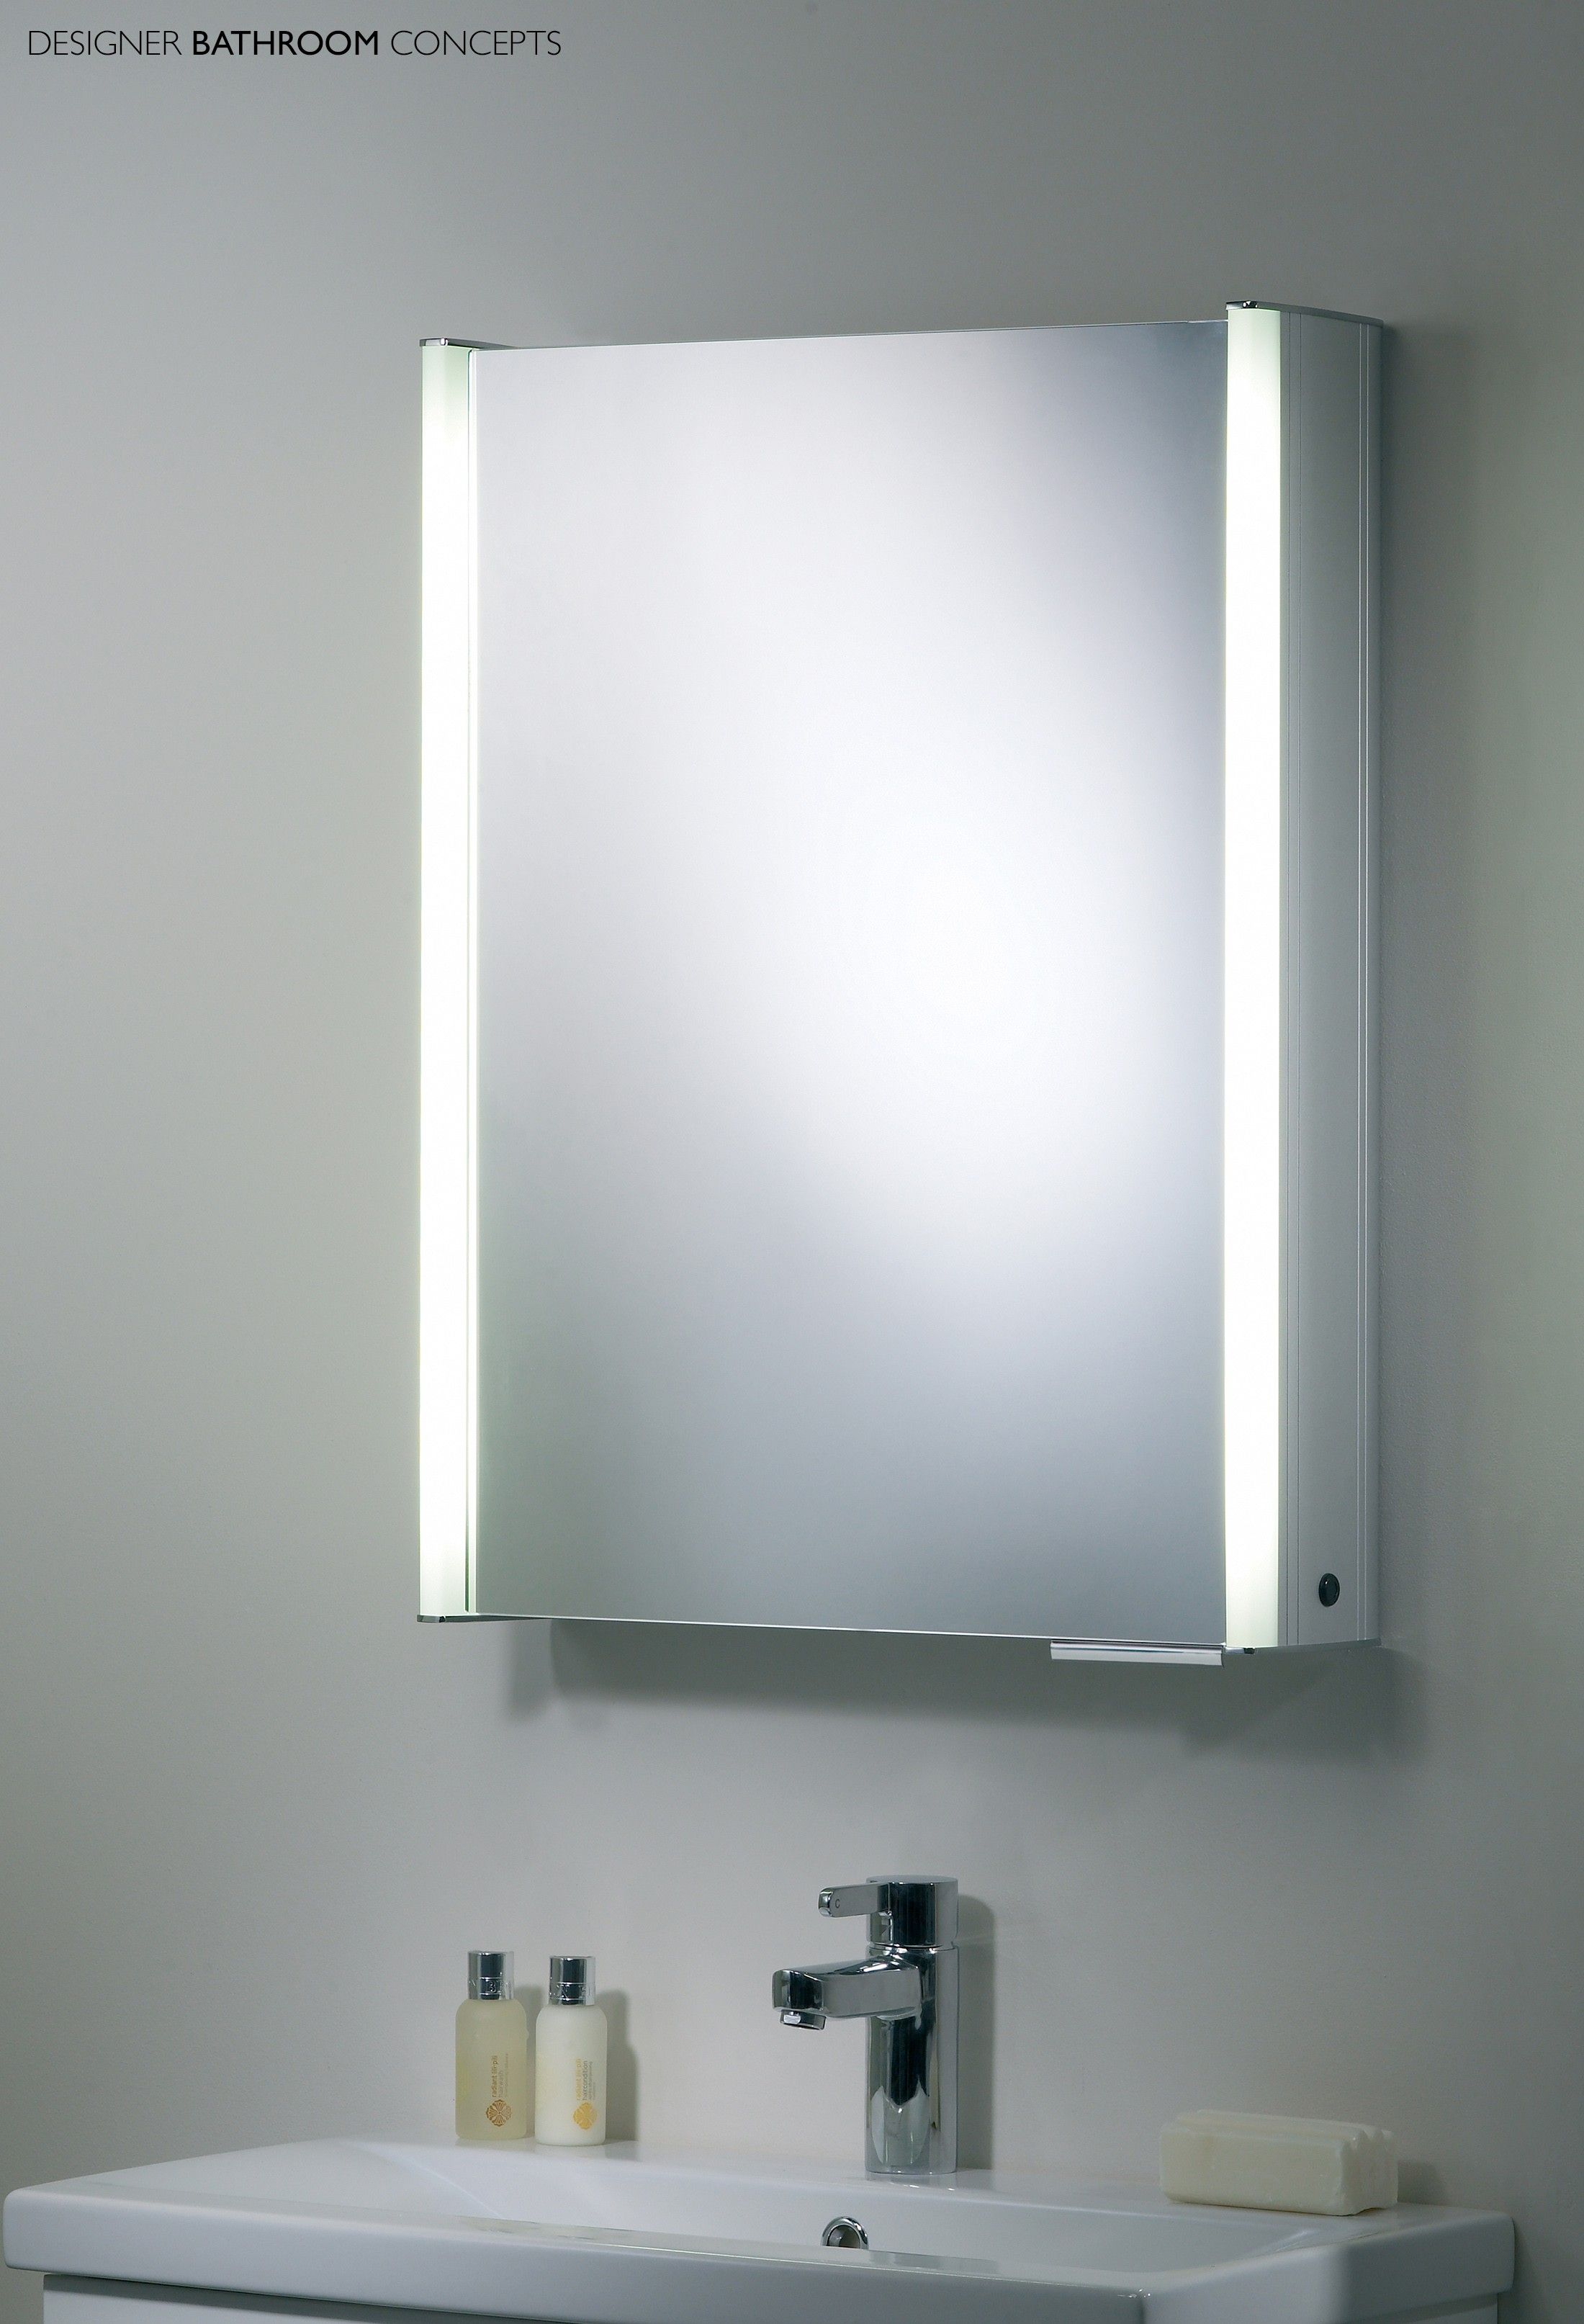 Plateau Designer Illuminated Bathroom Cabinet From Designerbathroomconcepts